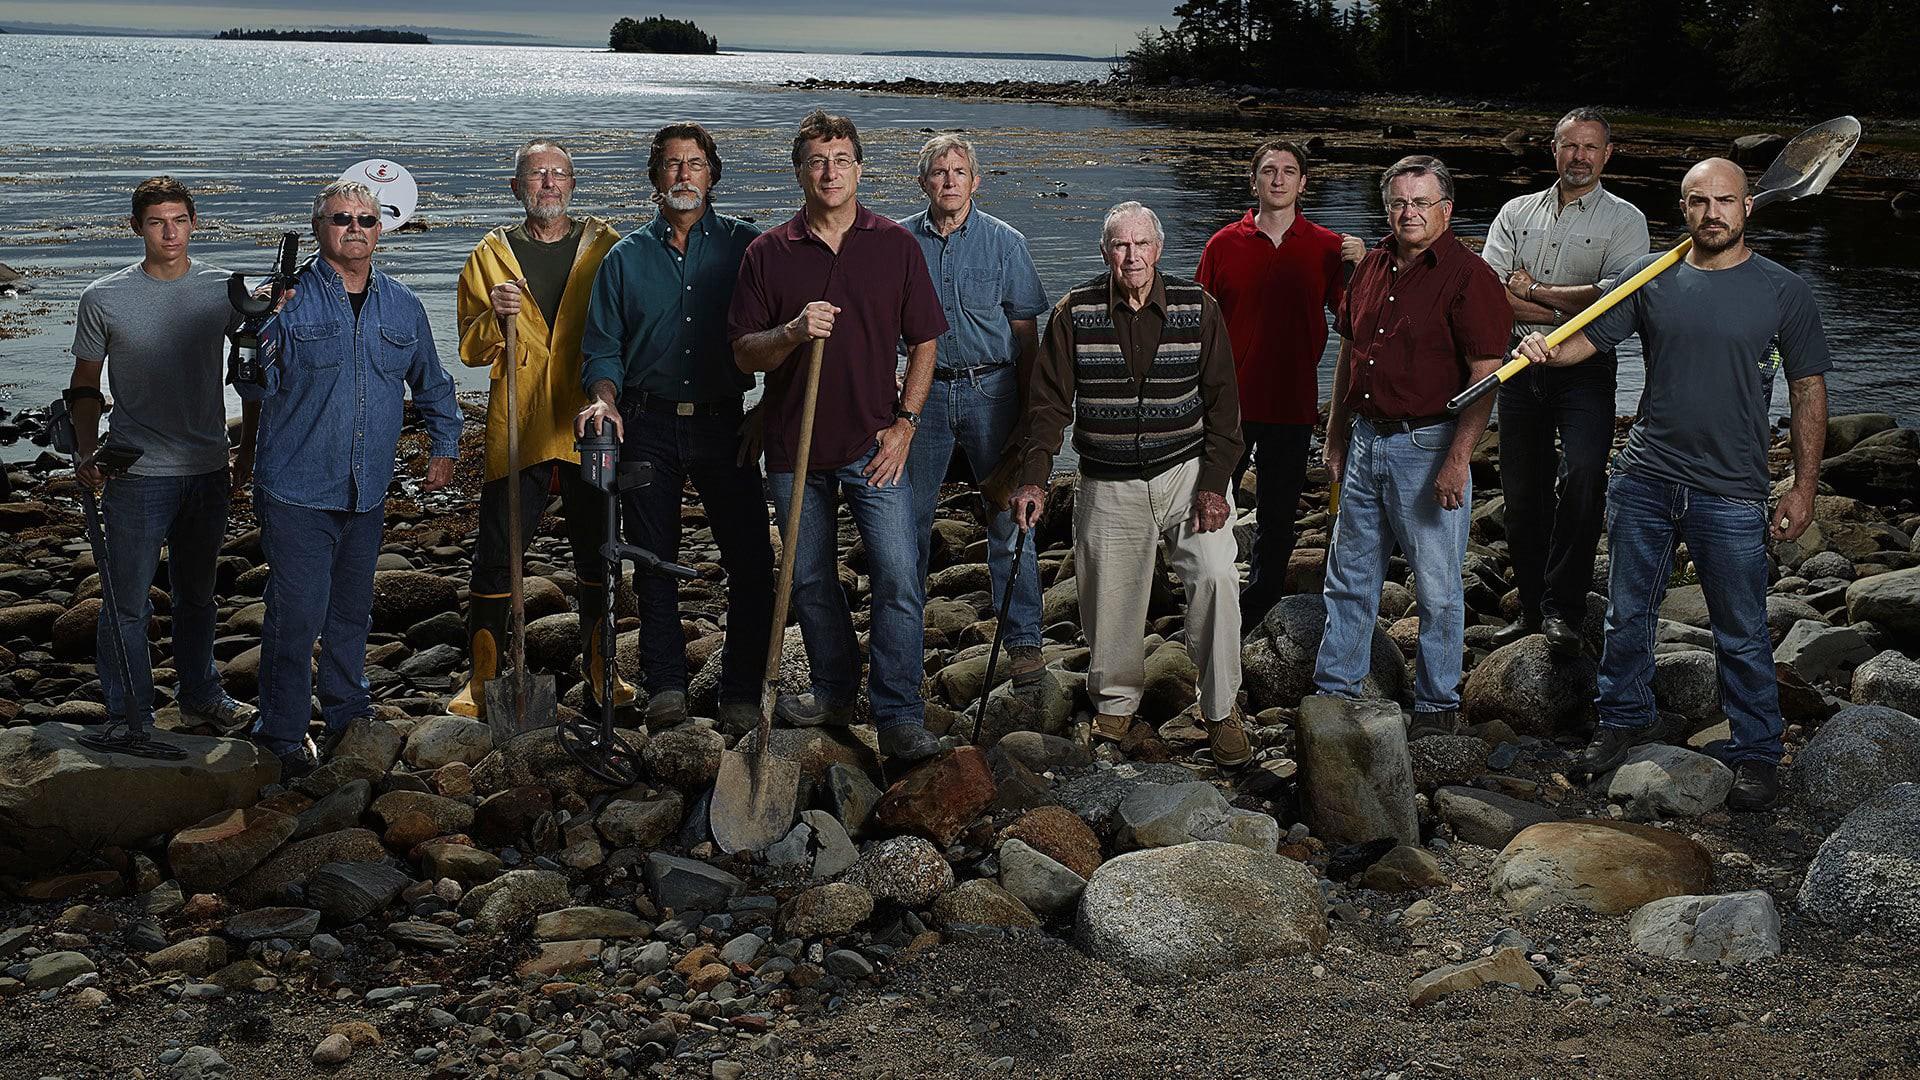 The Curse Of Oak Island Season 8 Casts